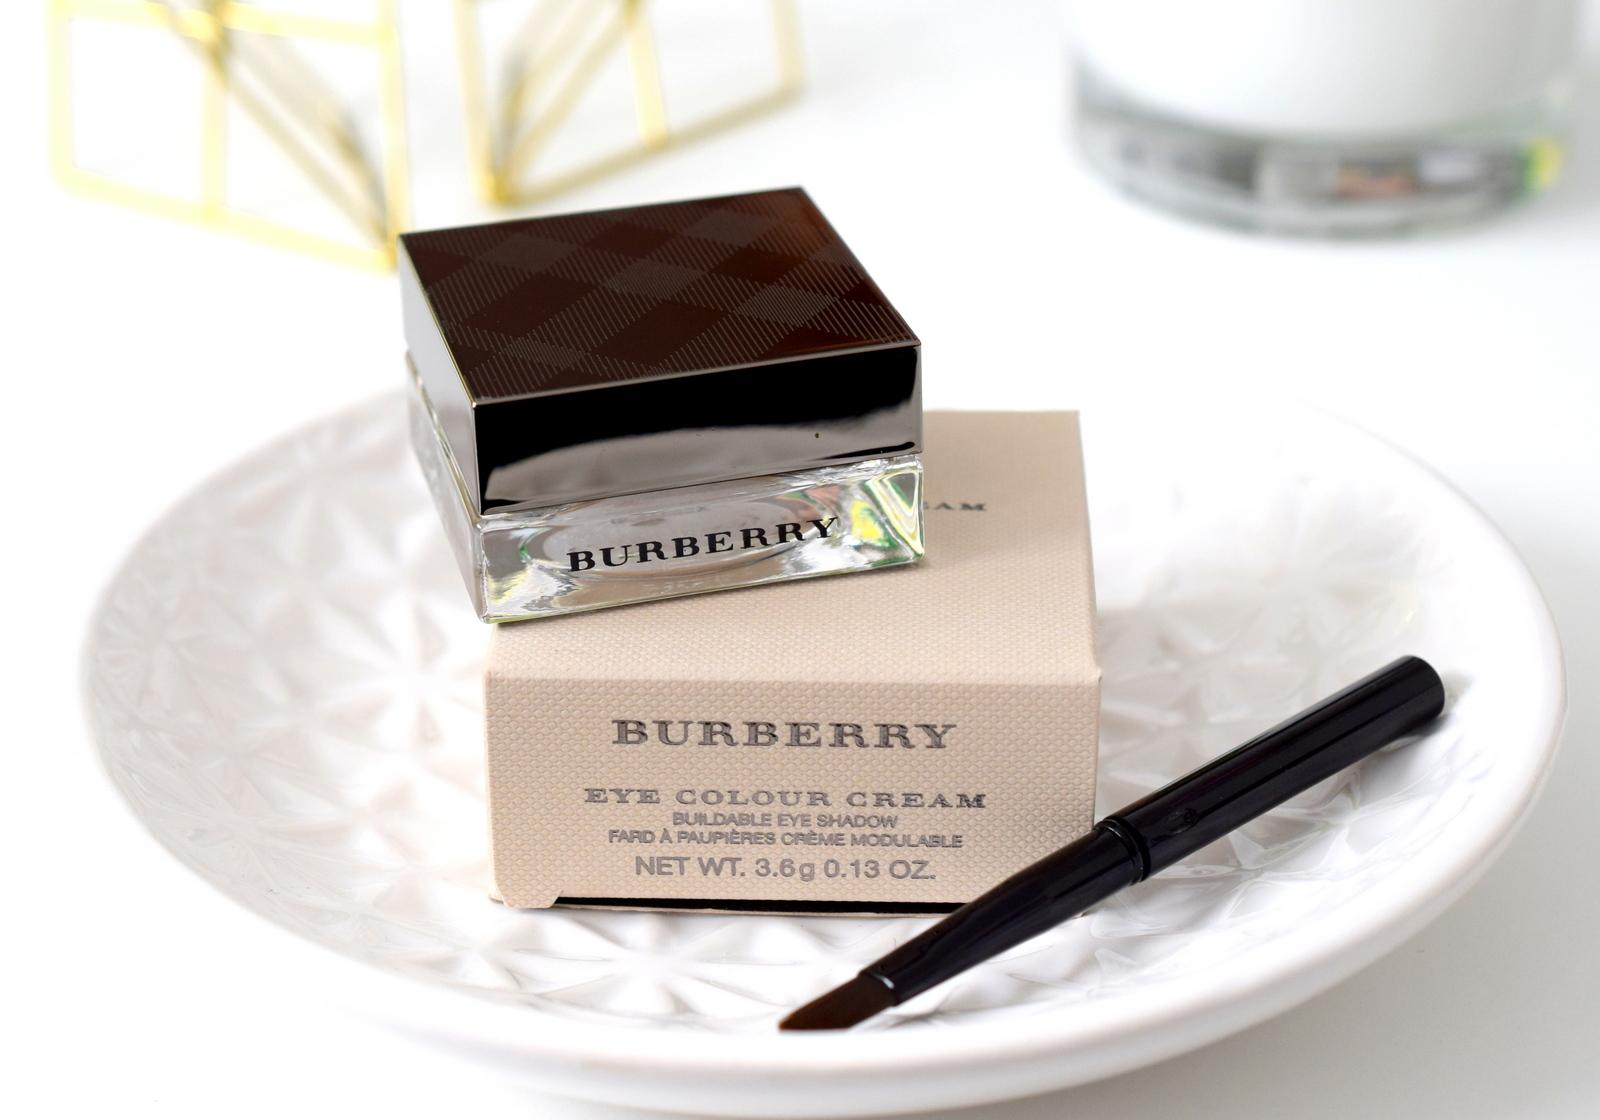 burberry-velvet-lace-review-eye-color-cream